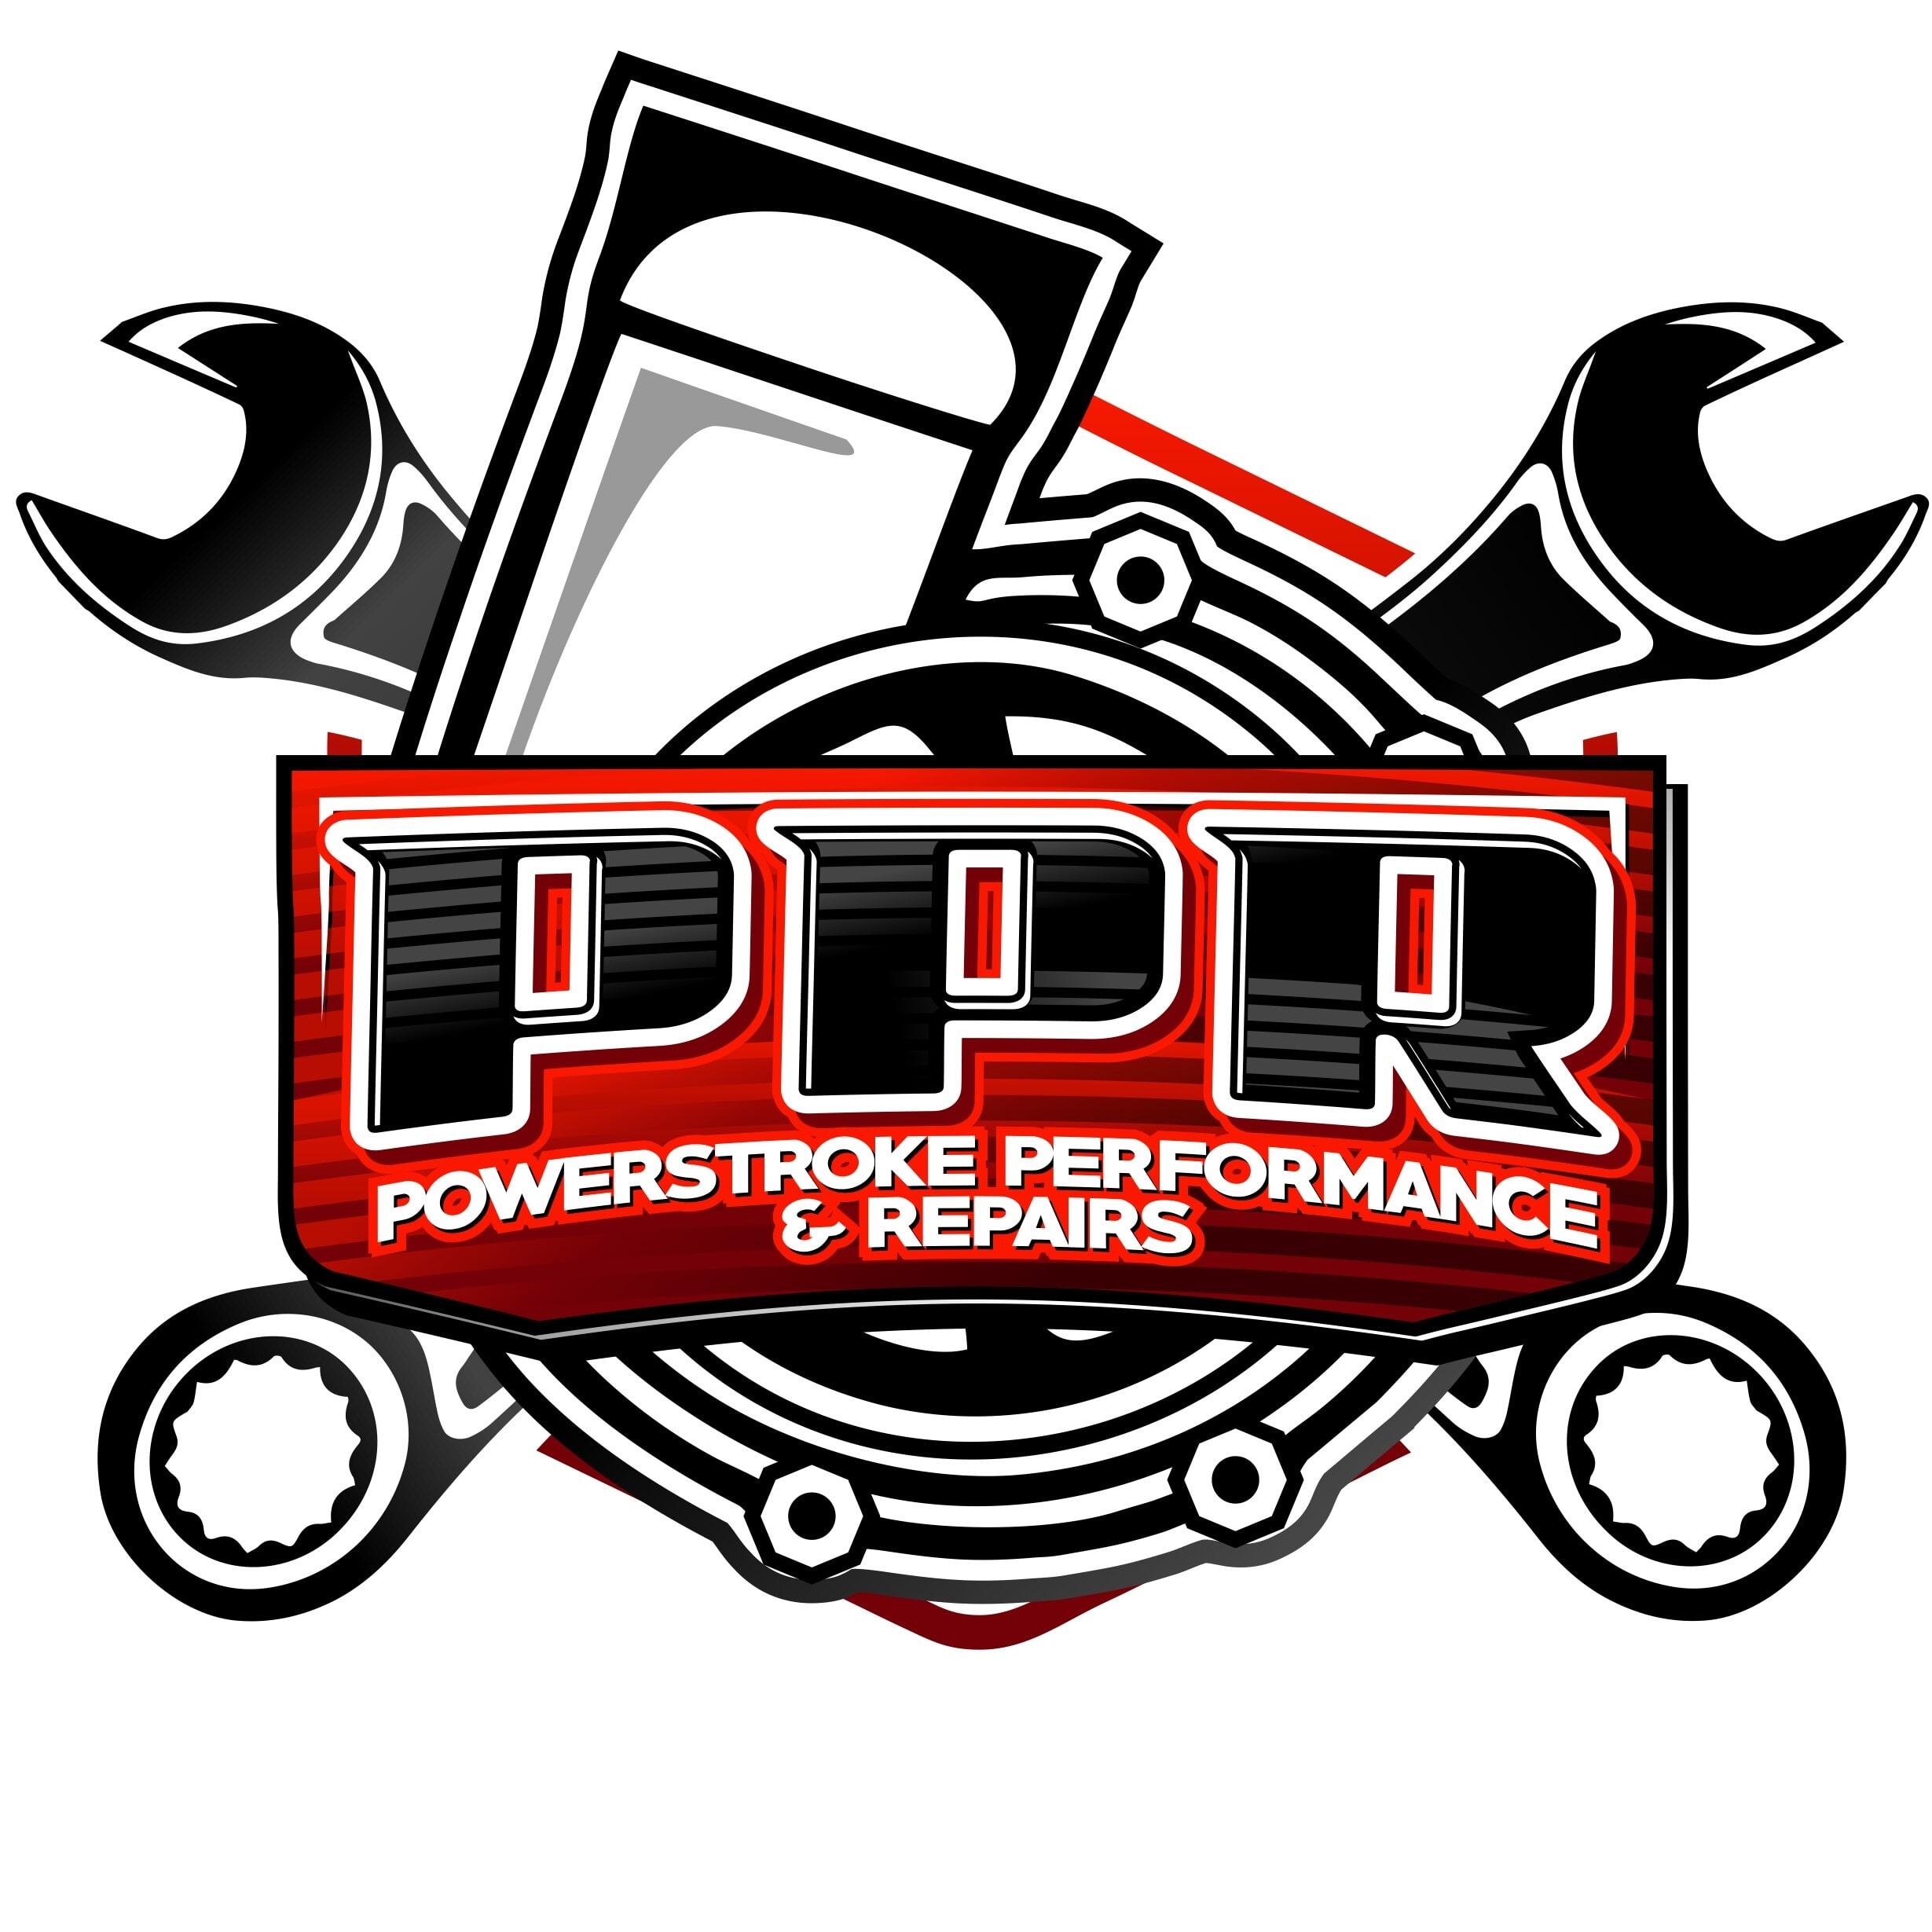 Powerstroke Performance & Repairs LLC